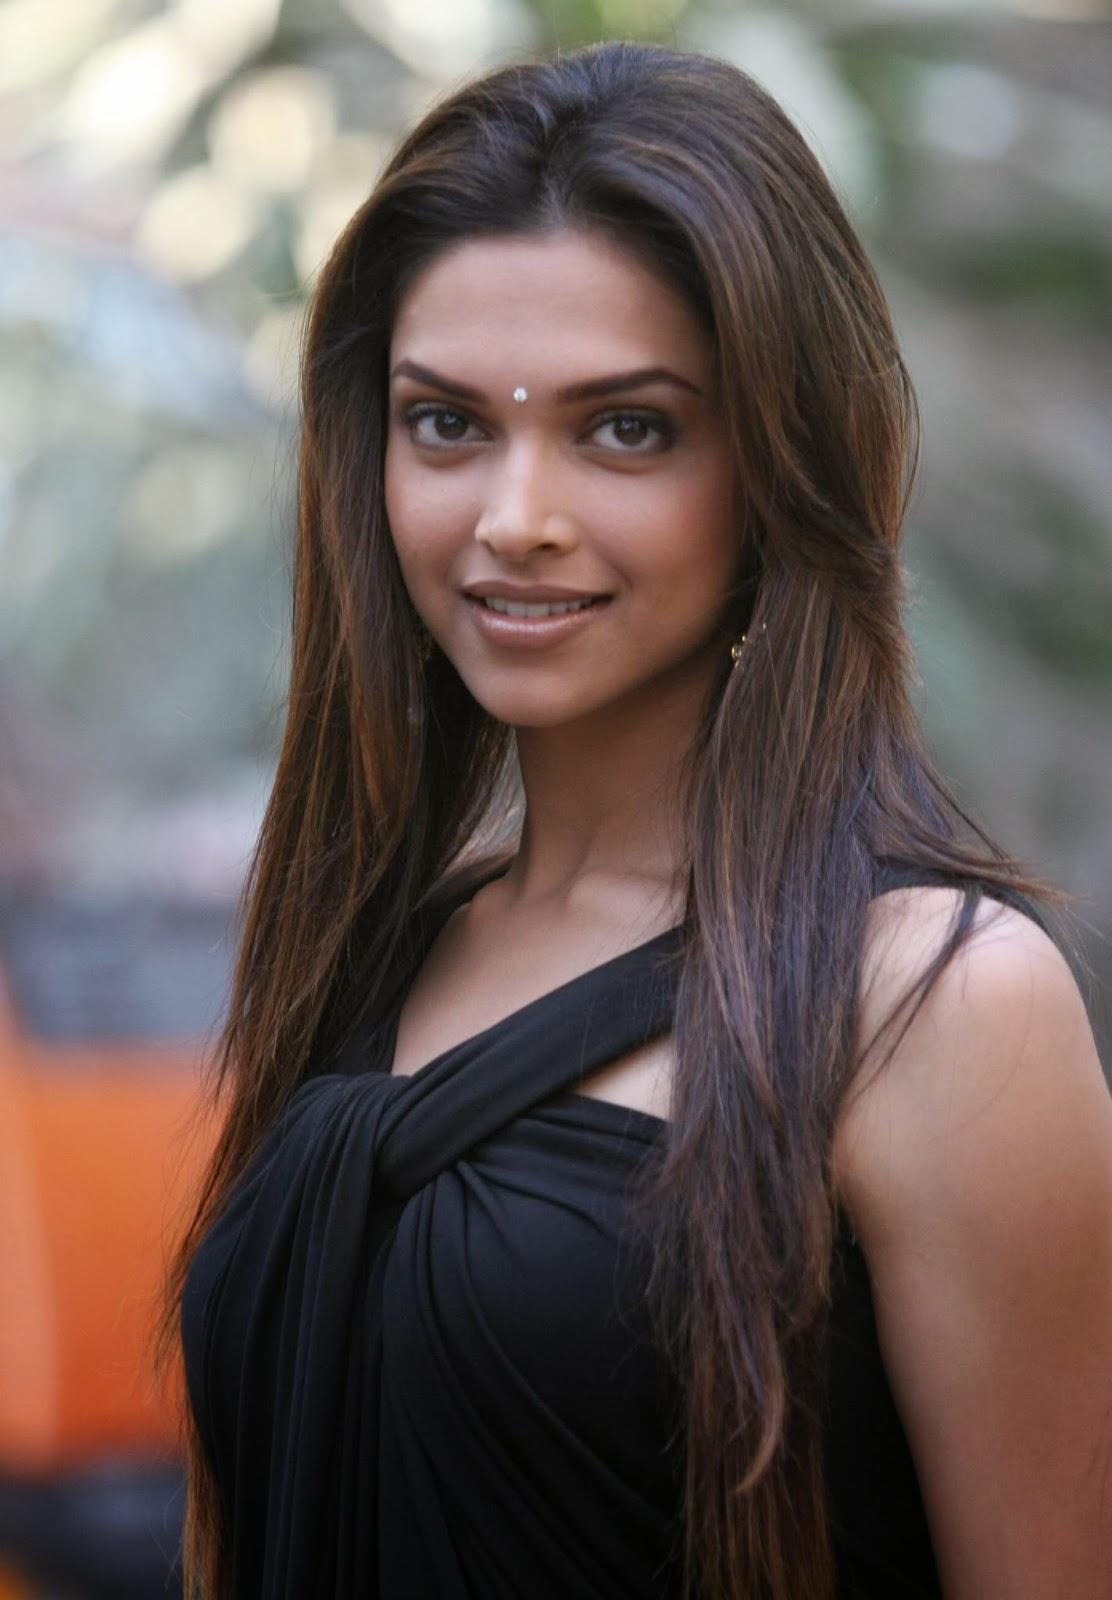 Deepika Padukone hot in black - HIGH RESOLUTION PICTURES